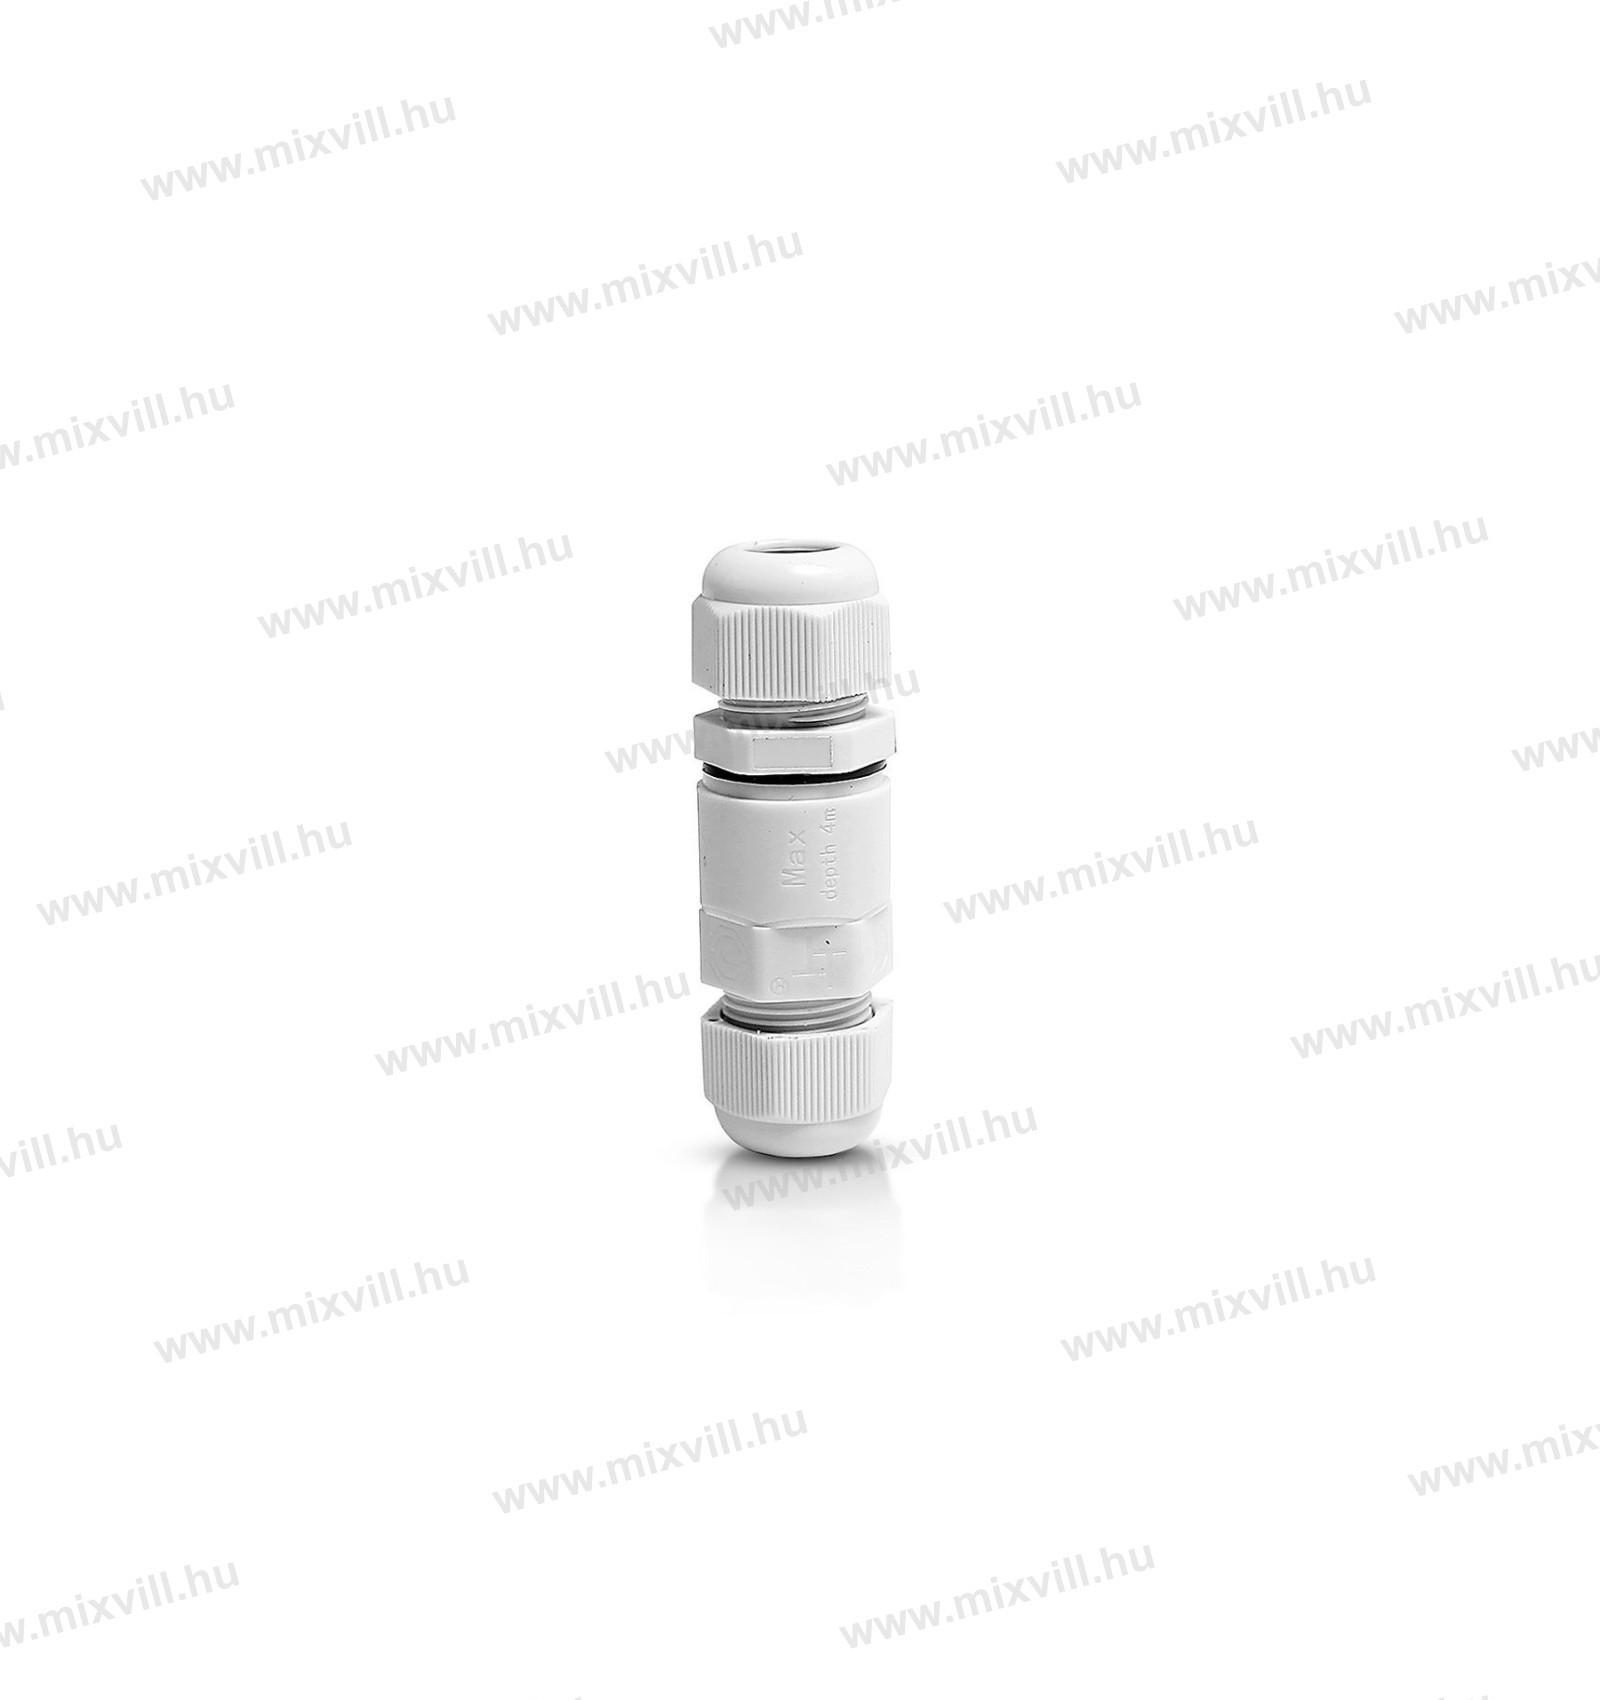 v-tac-sku-5986_kabeltoldo-reflektor-vizmentes-ip68